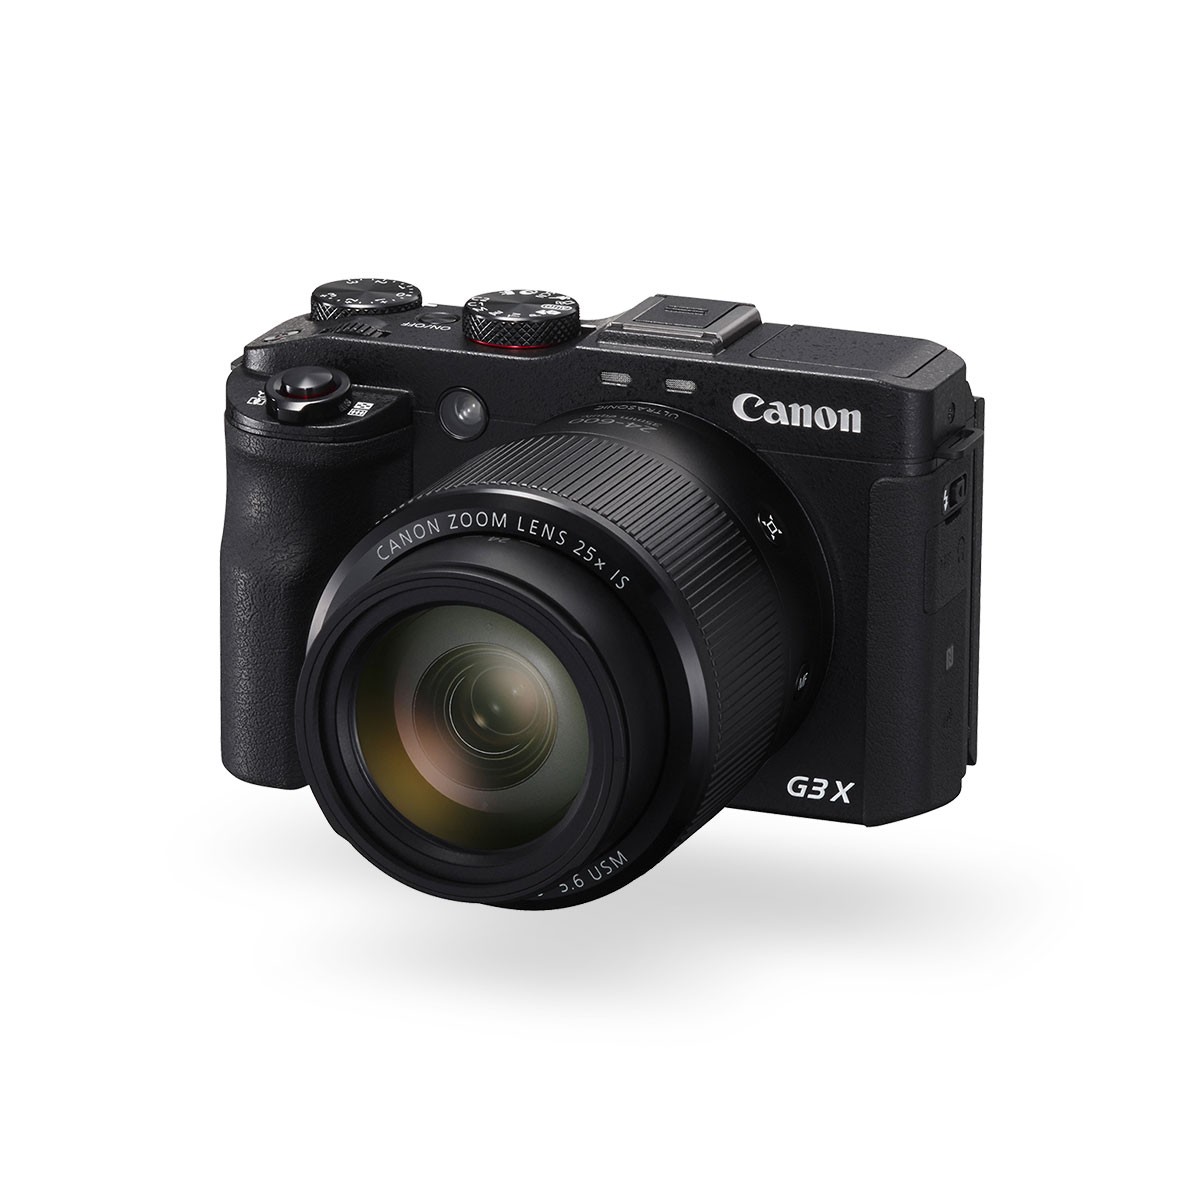 Canon PowerShot G3 X black front angled